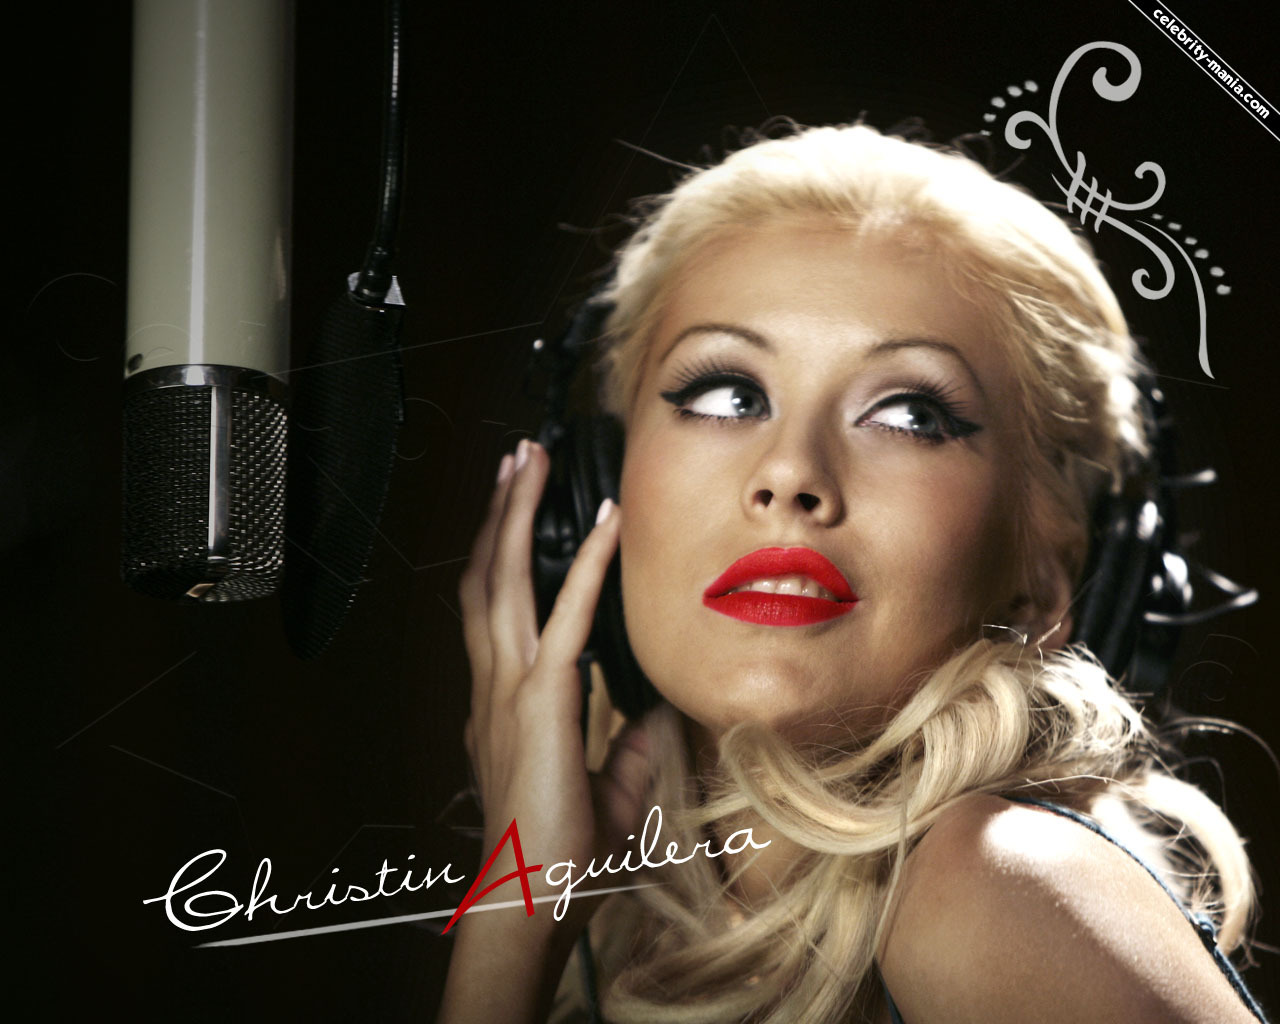 http://4.bp.blogspot.com/-wsue2gaCYmw/TwQxCi8jAnI/AAAAAAAAAkA/WF71CHgYT0k/s1600/Christina-christina-aguilera-982343_1280_1024.jpg